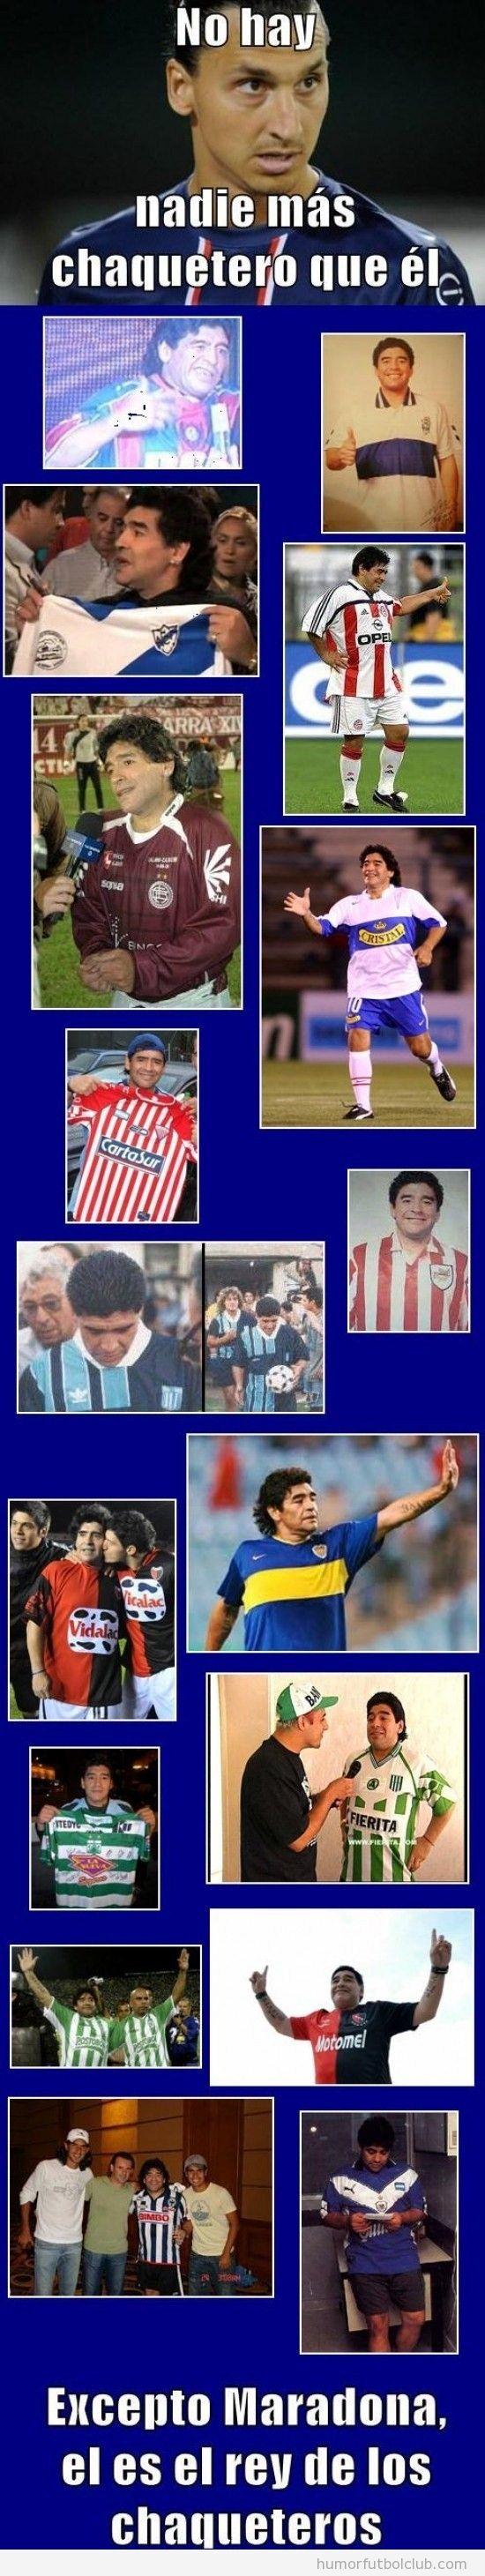 Meme fútbol, Ibrahimovic y Maradona chaqueteros